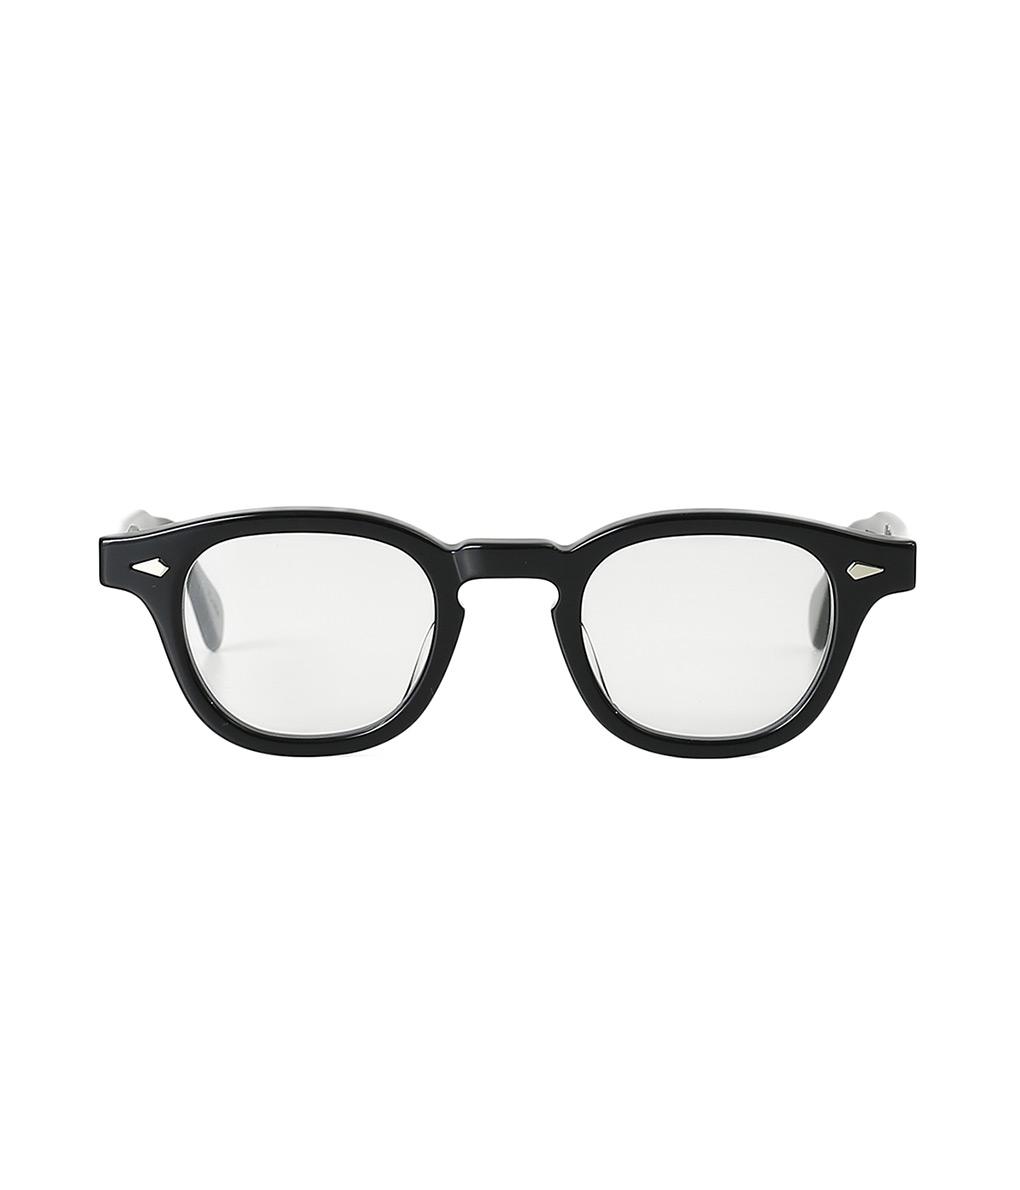 JULIUS TART OPTICAL / ジュリアスタートオプティカル : AR 44 46-24 - BLACK / CLEAR - : サングラス アクセサリー メガネ 眼鏡 : JTPL-101A-2A-wise【WIS】